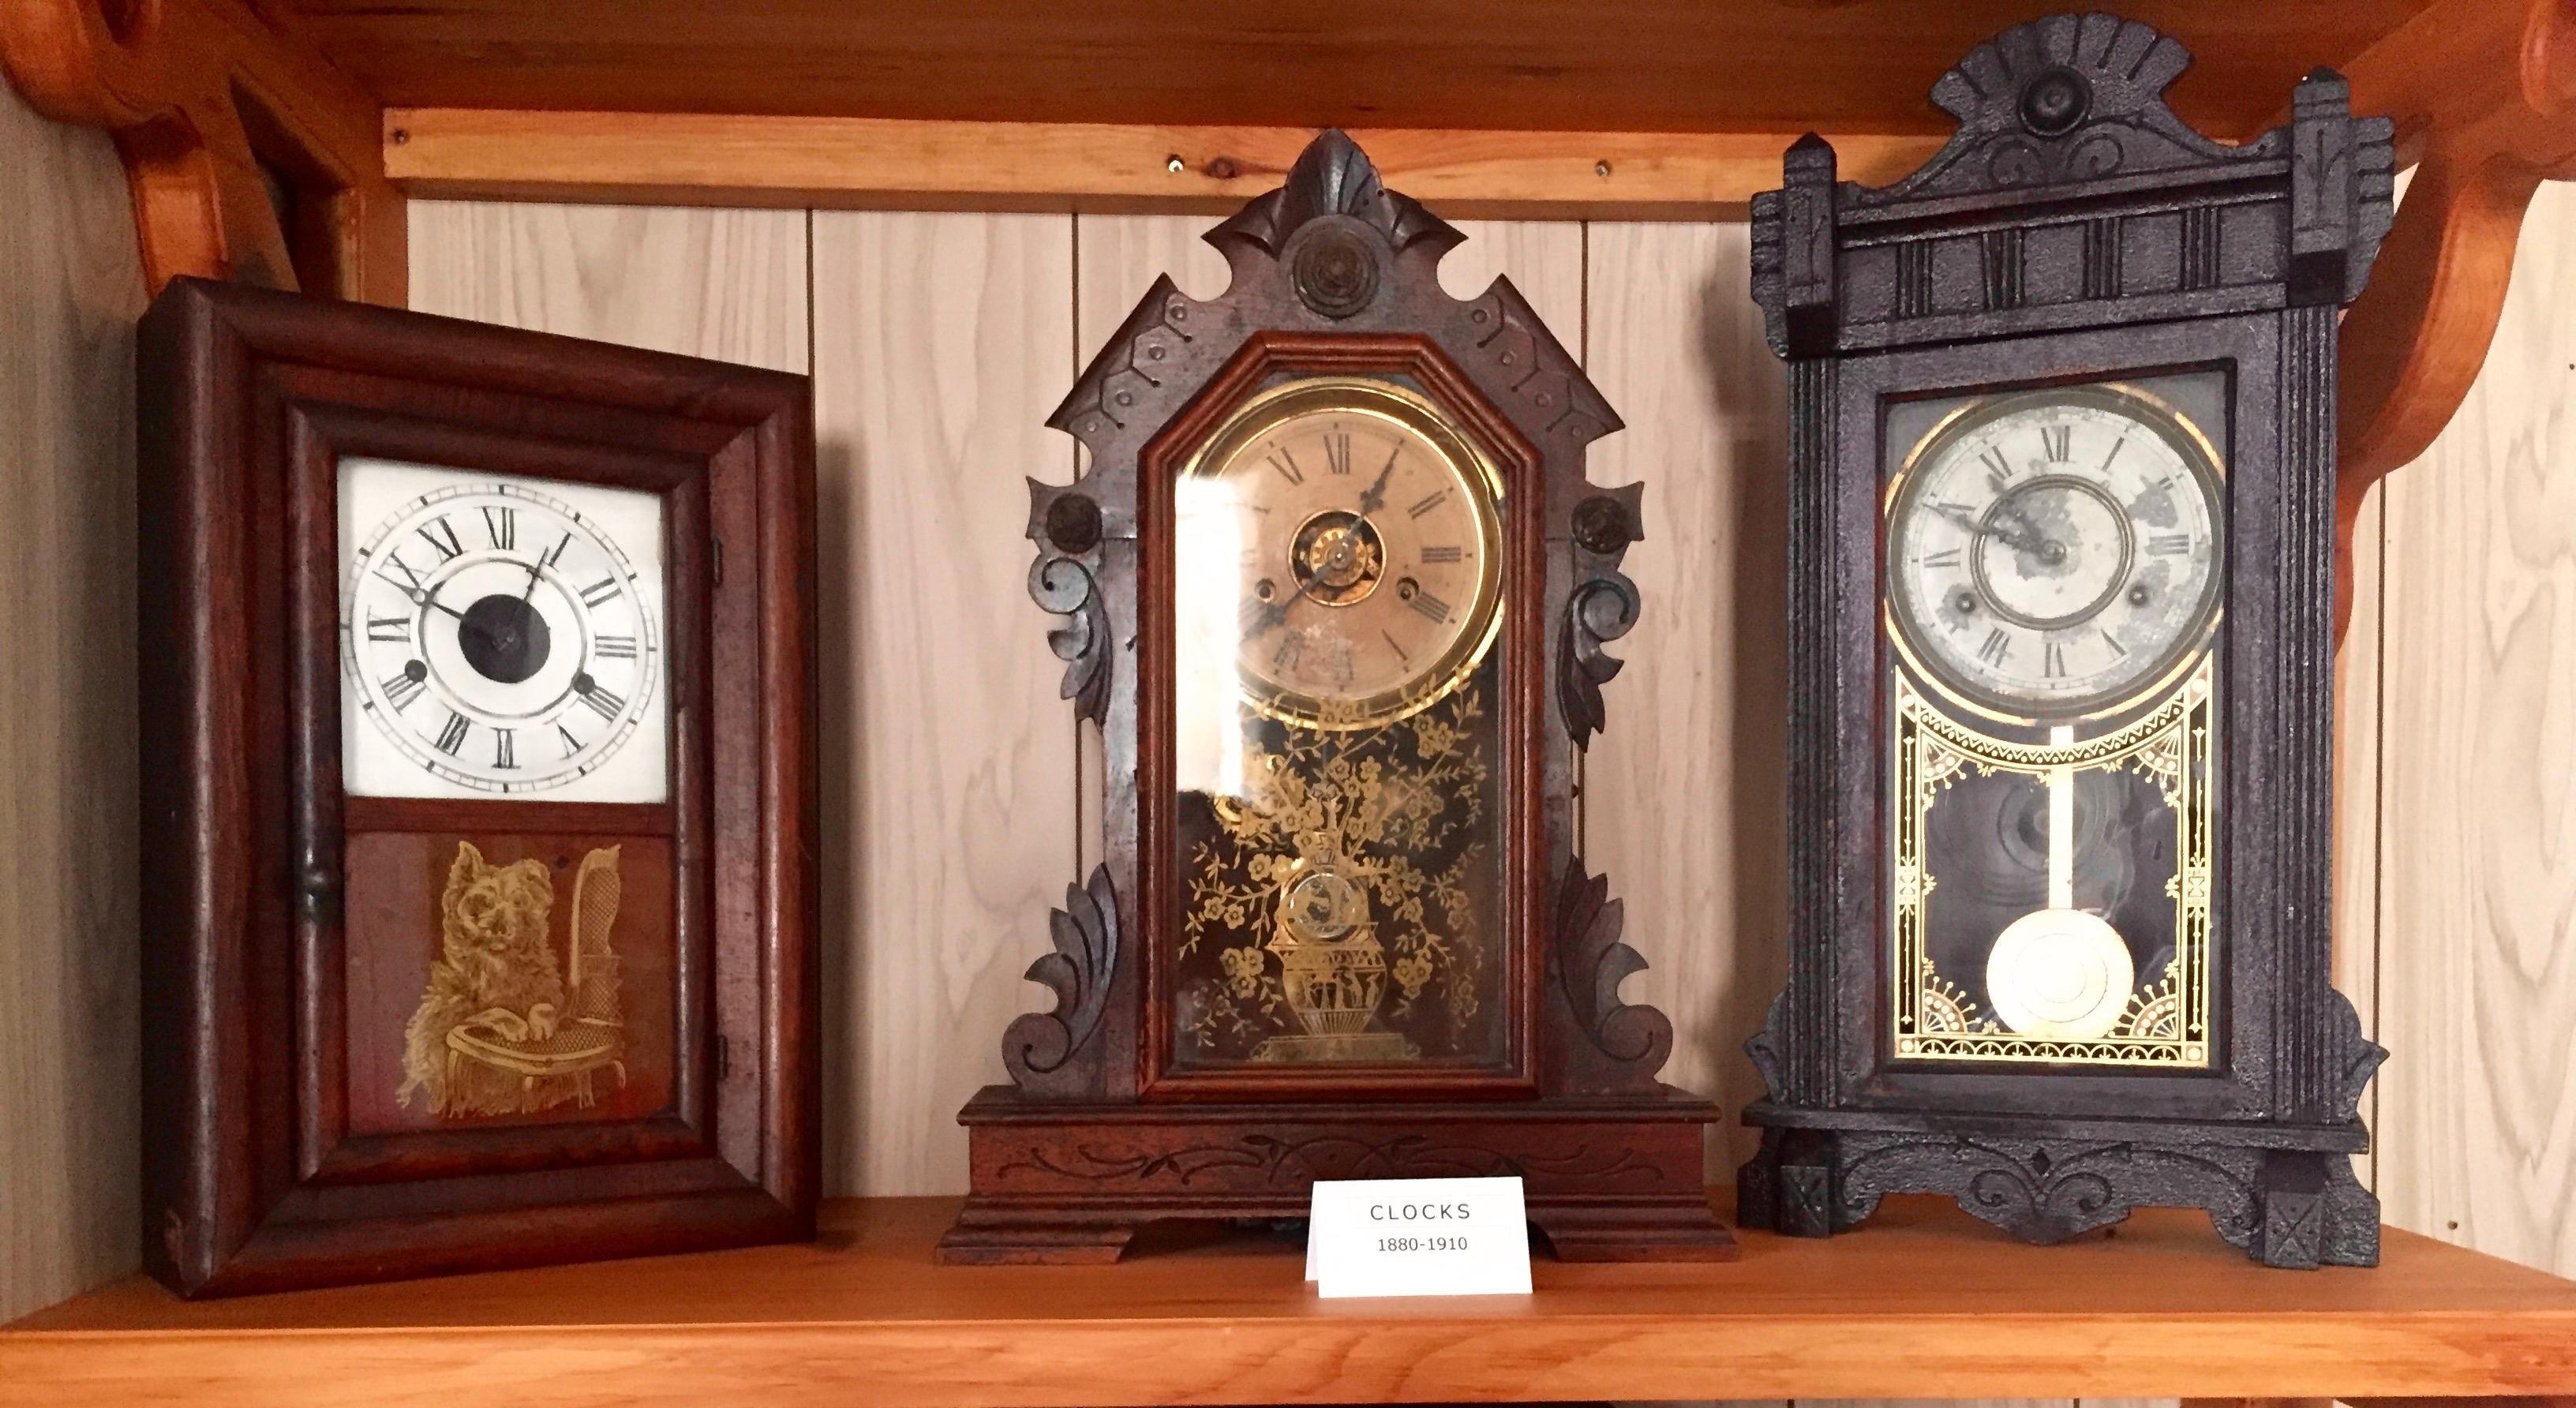 Clocks 1880-1910